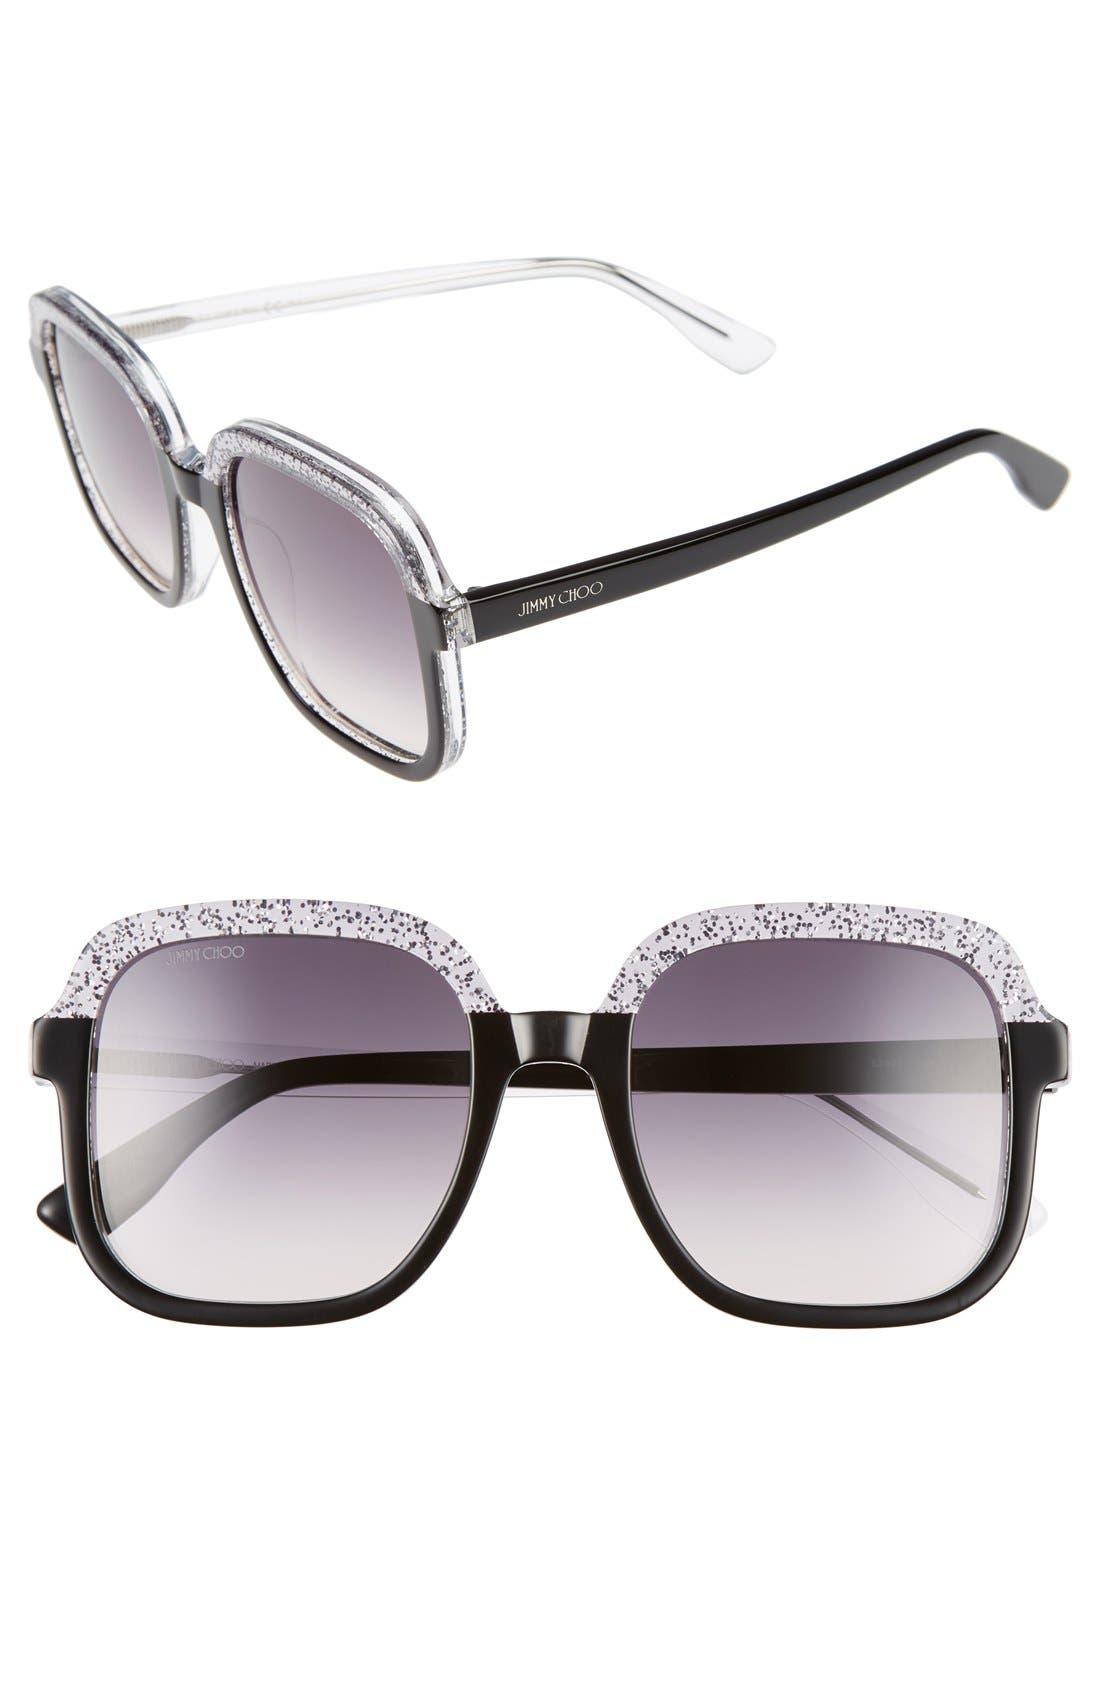 53mm Glitter Frame Sunglasses,                             Main thumbnail 1, color,                             001